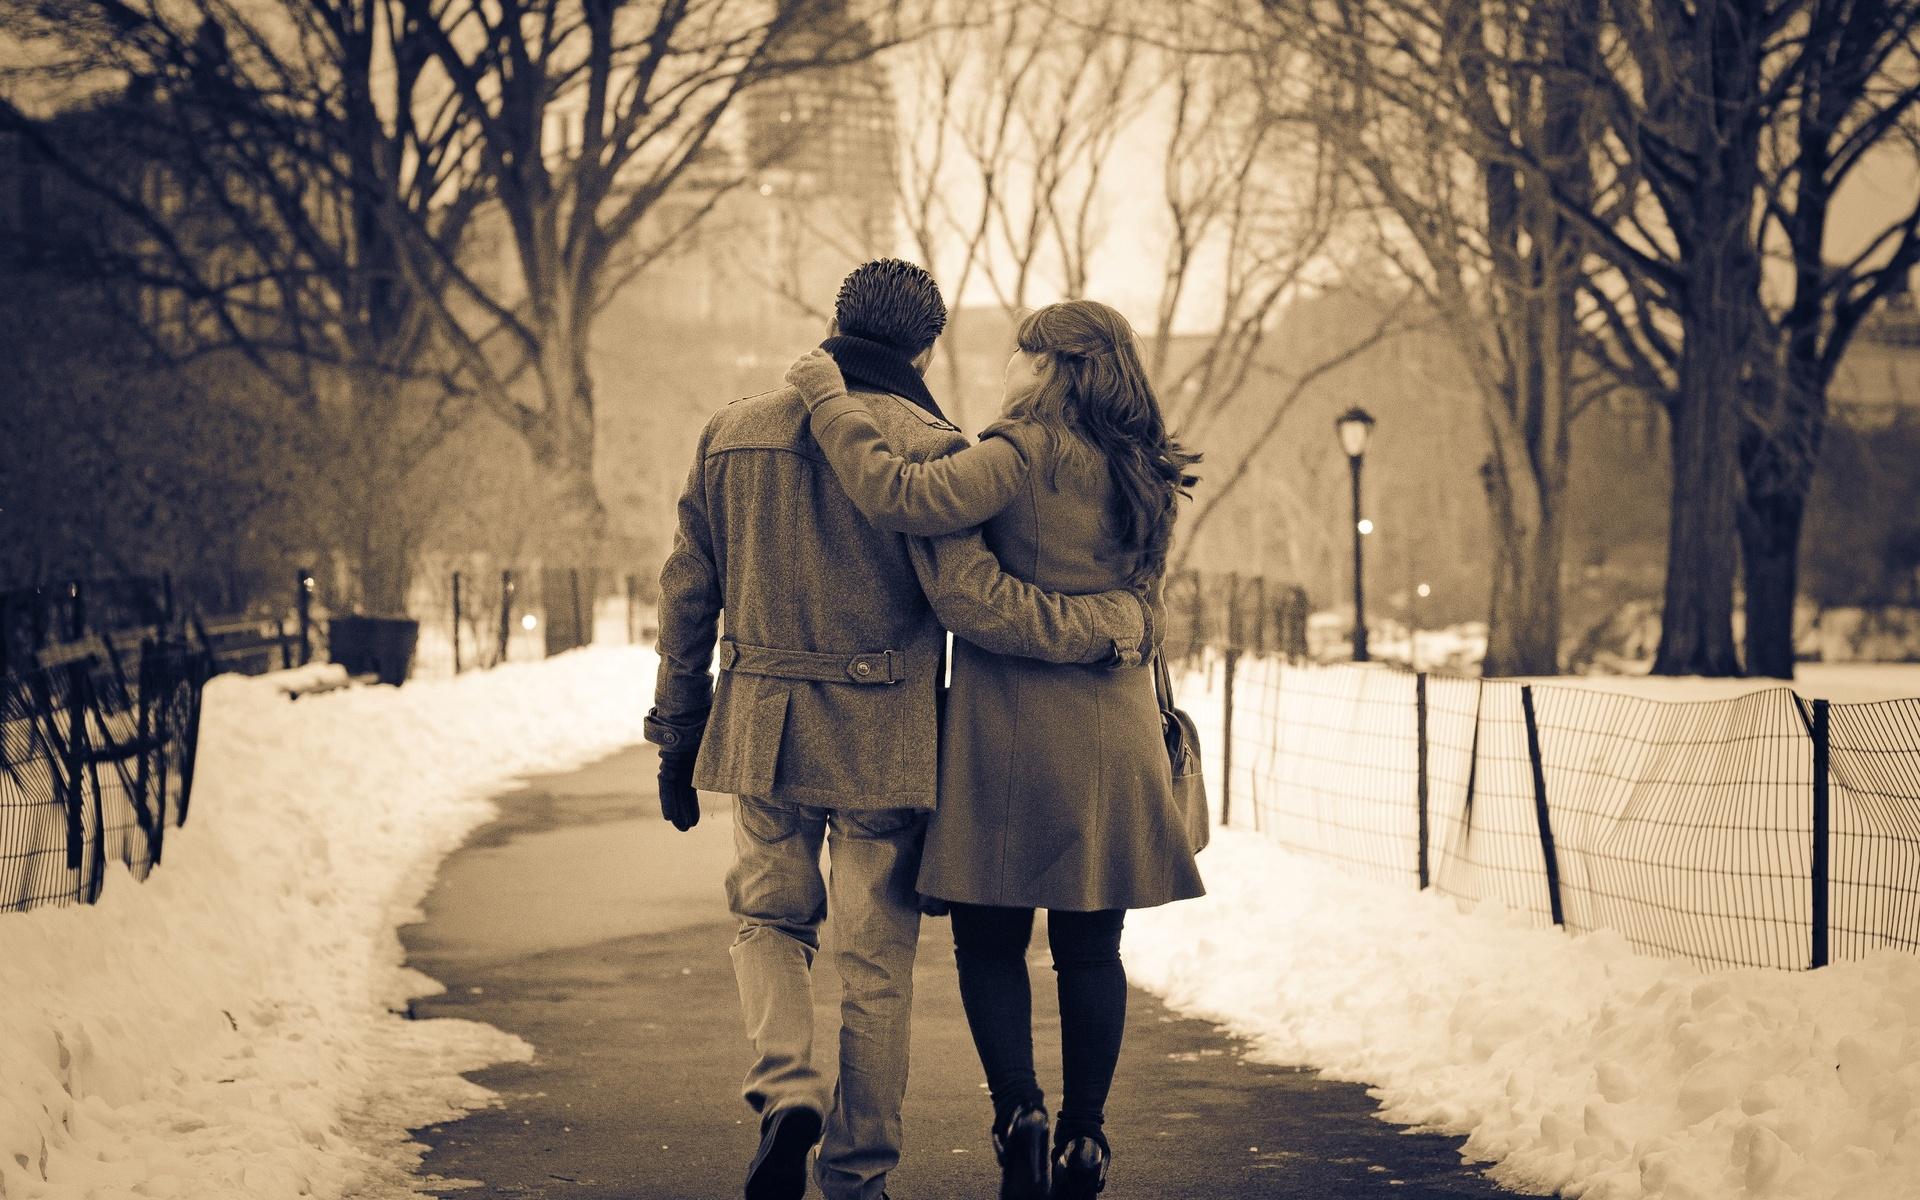 couple-love-park-a-in-girl-boy-mood-hd-953880